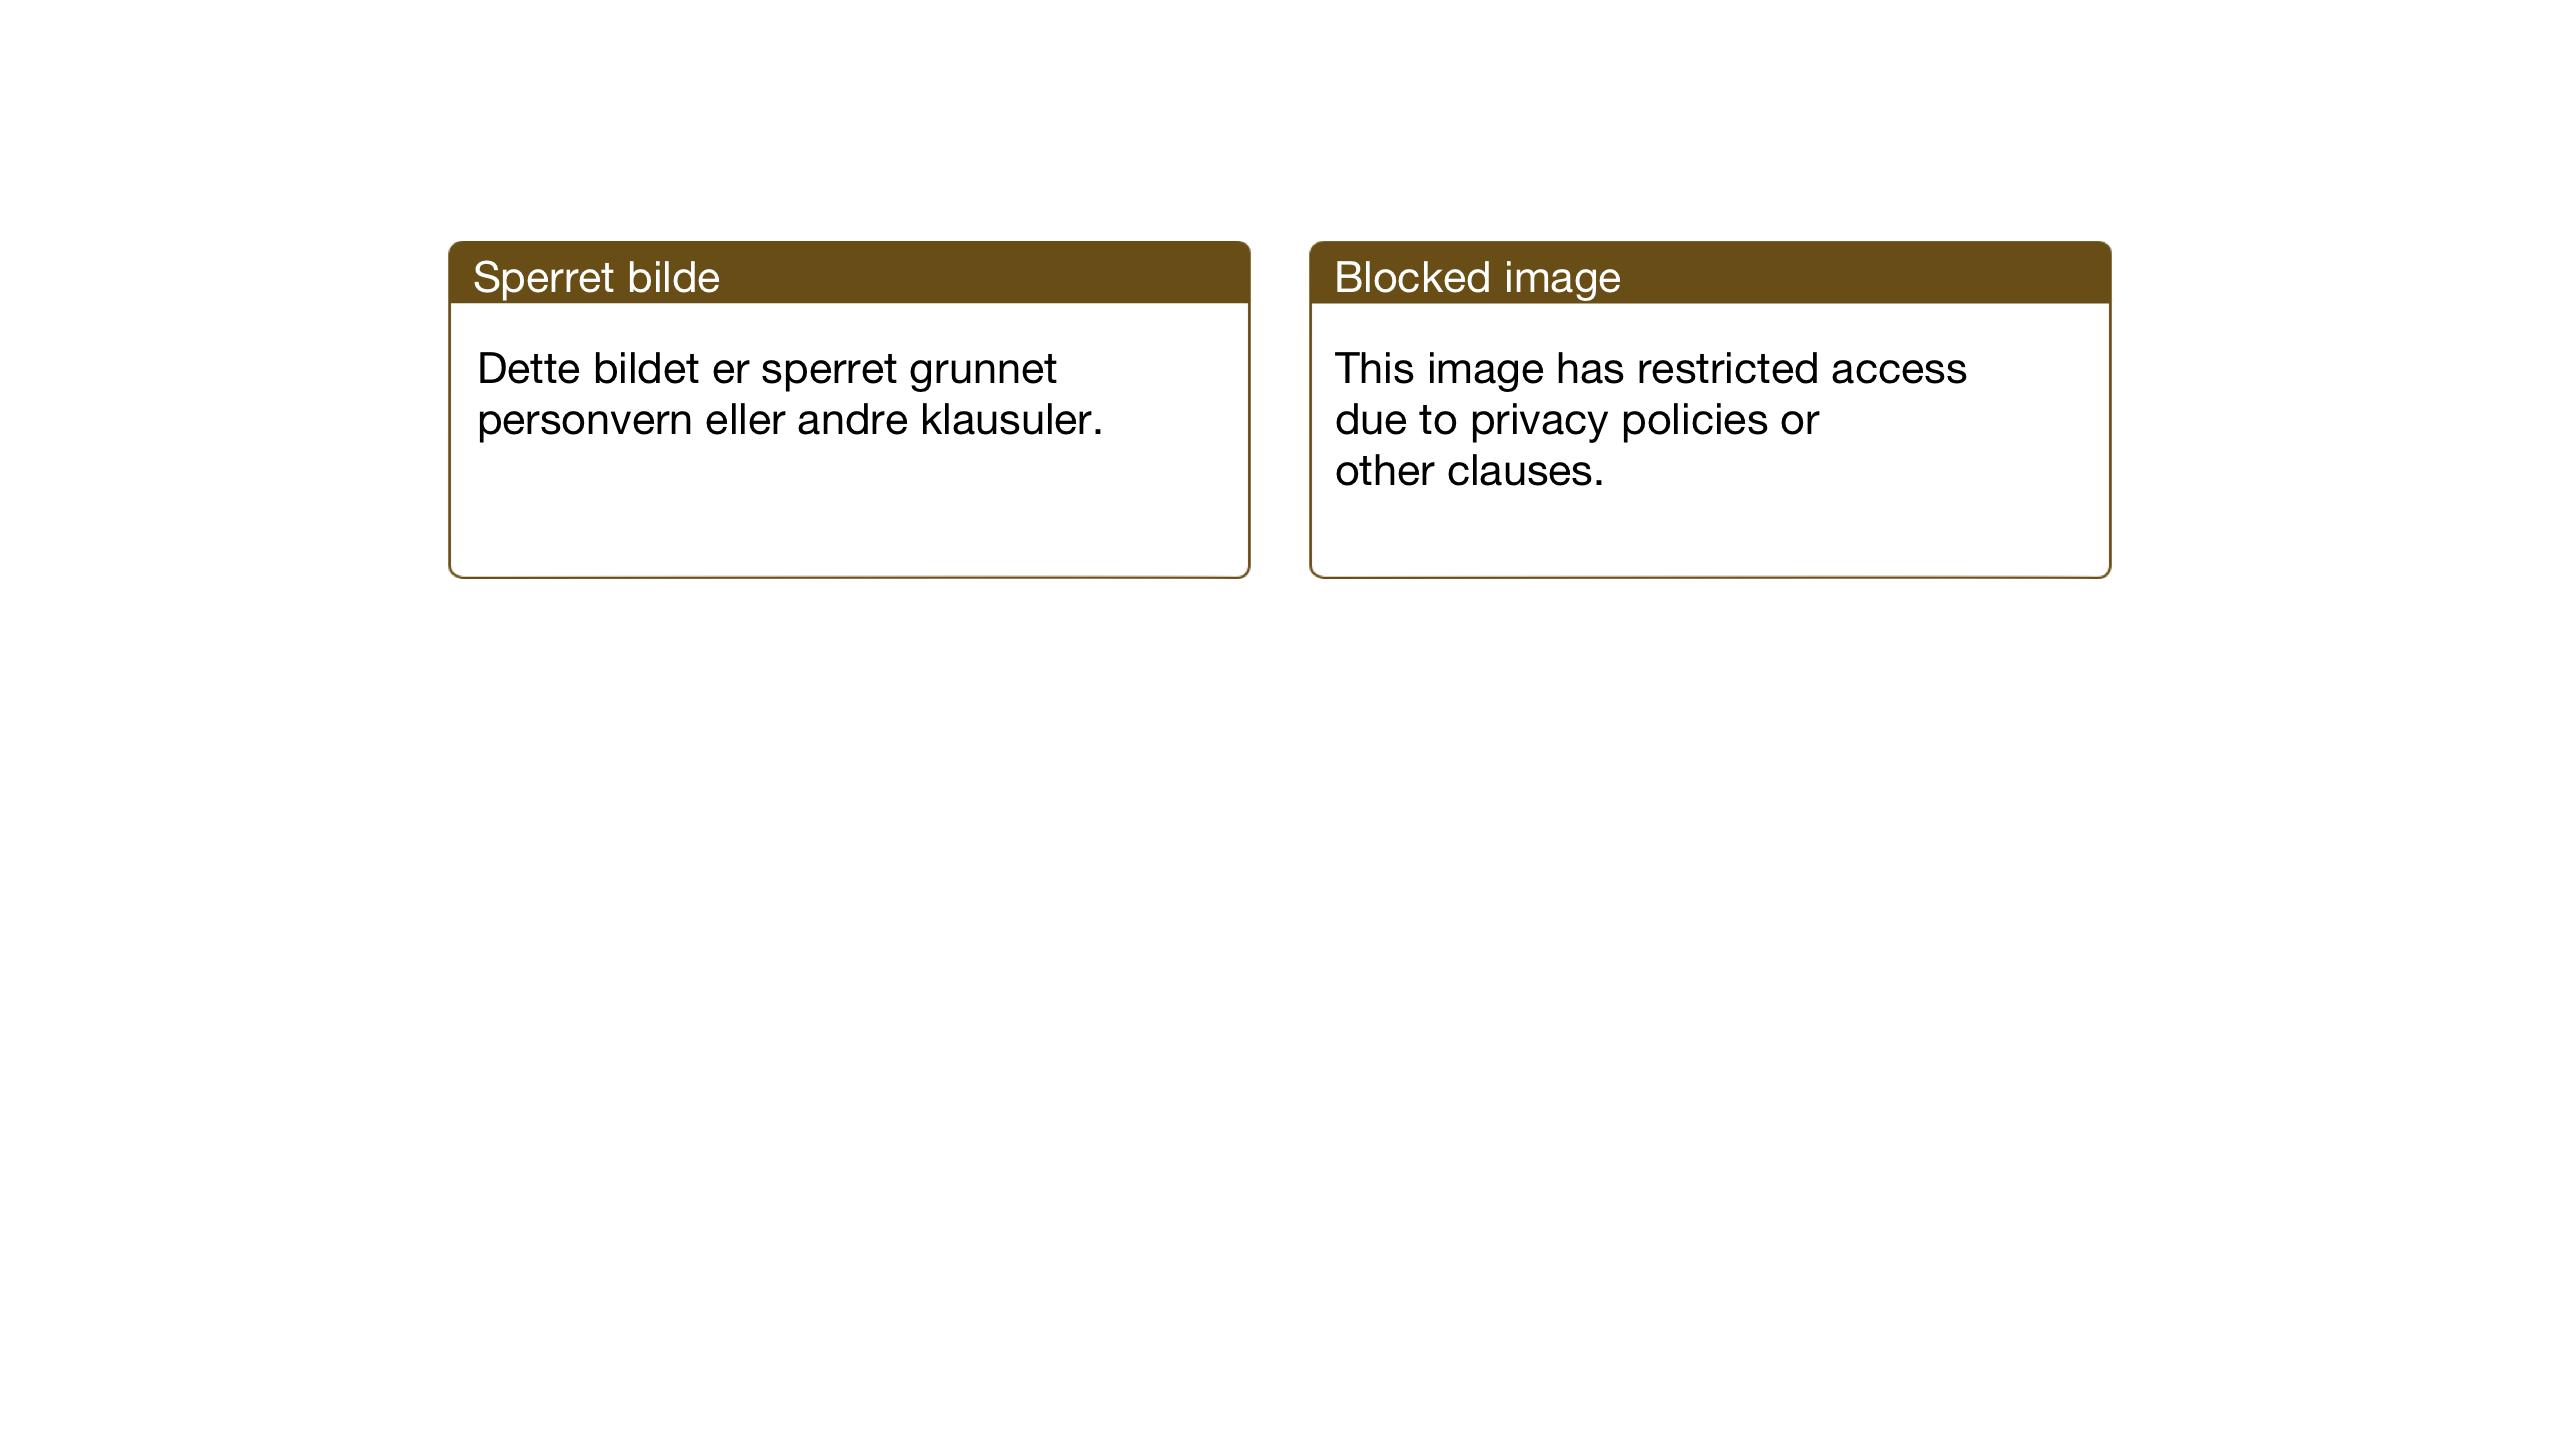 SAB, Domkirken Sokneprestembete, H/Haa: Ministerialbok nr. C 9, 1958-2001, s. 169b-170a